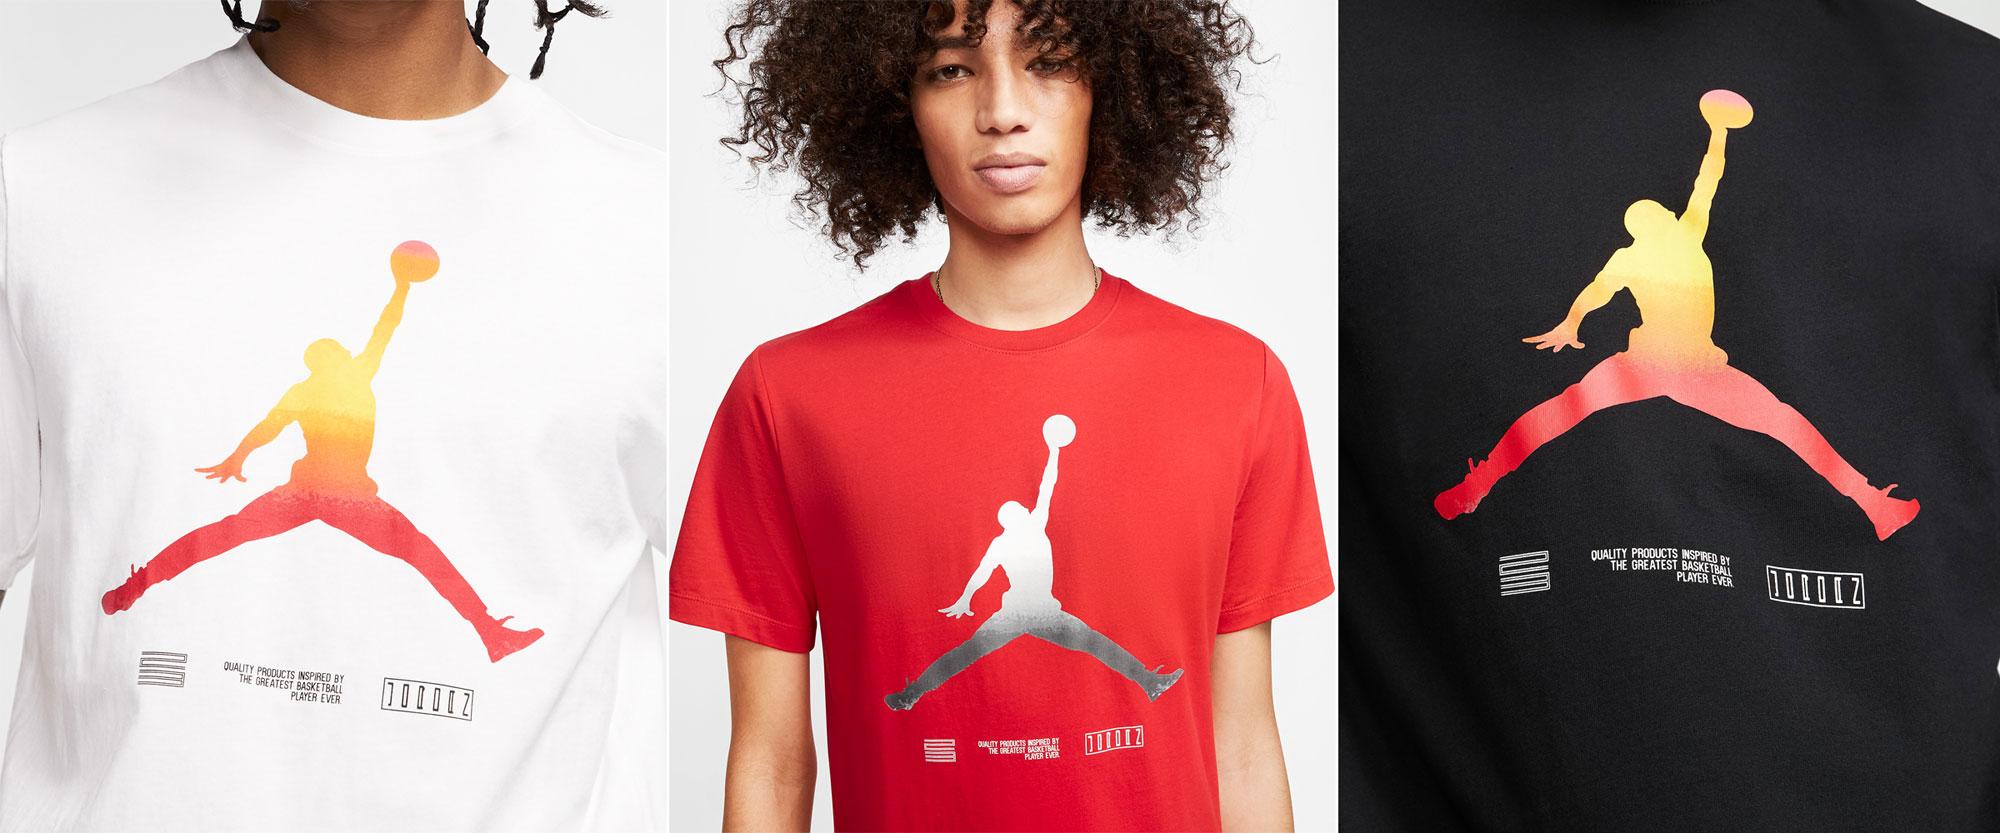 Air Jordan 11 Low White Bred Concord Shirt Sneakerfits Com